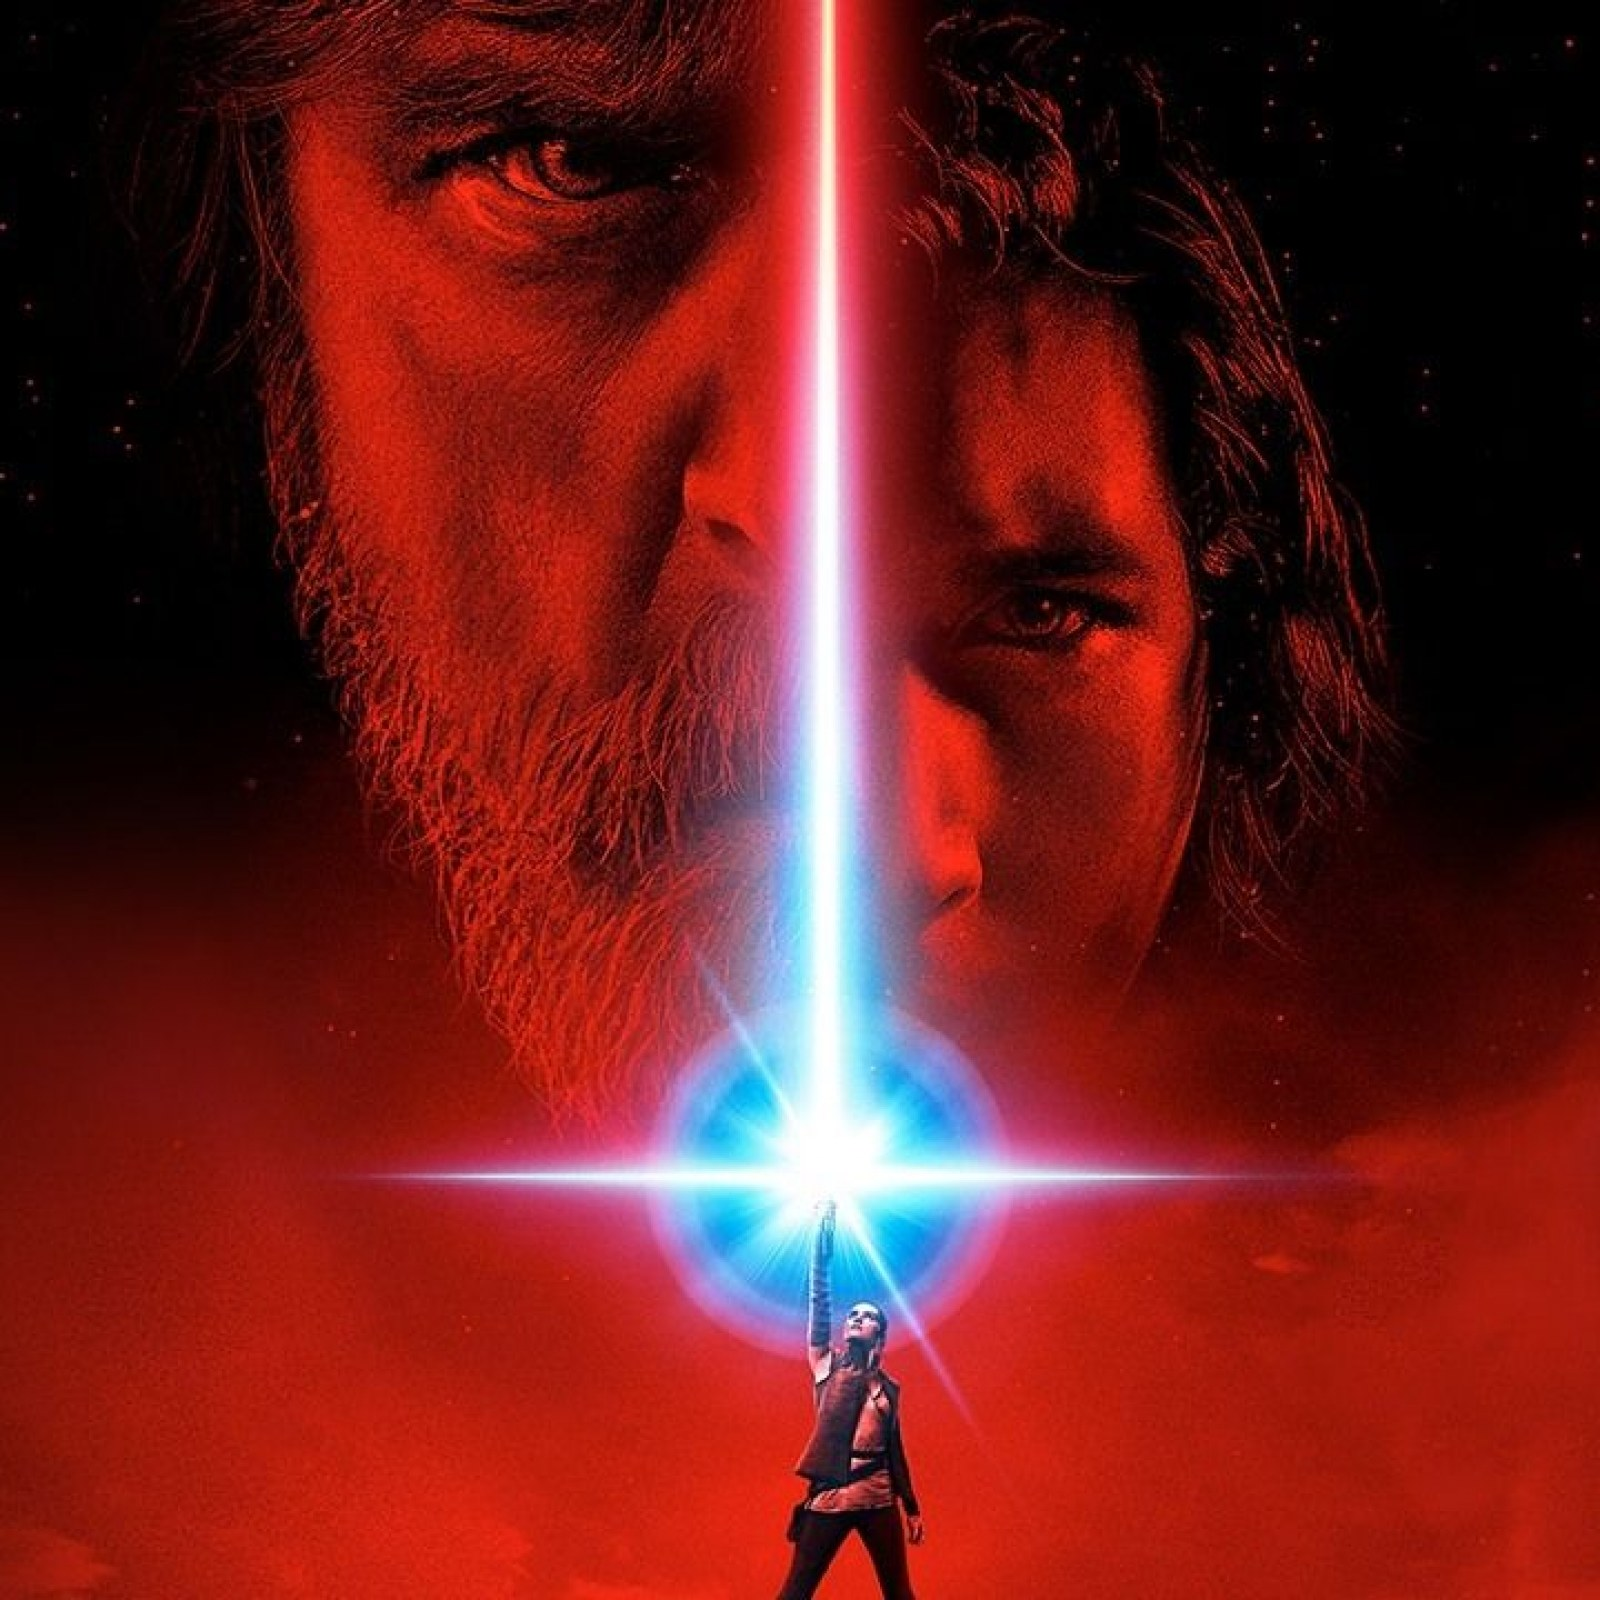 Star Wars The Last Jedi Trailer Teases Rey S Dark Side